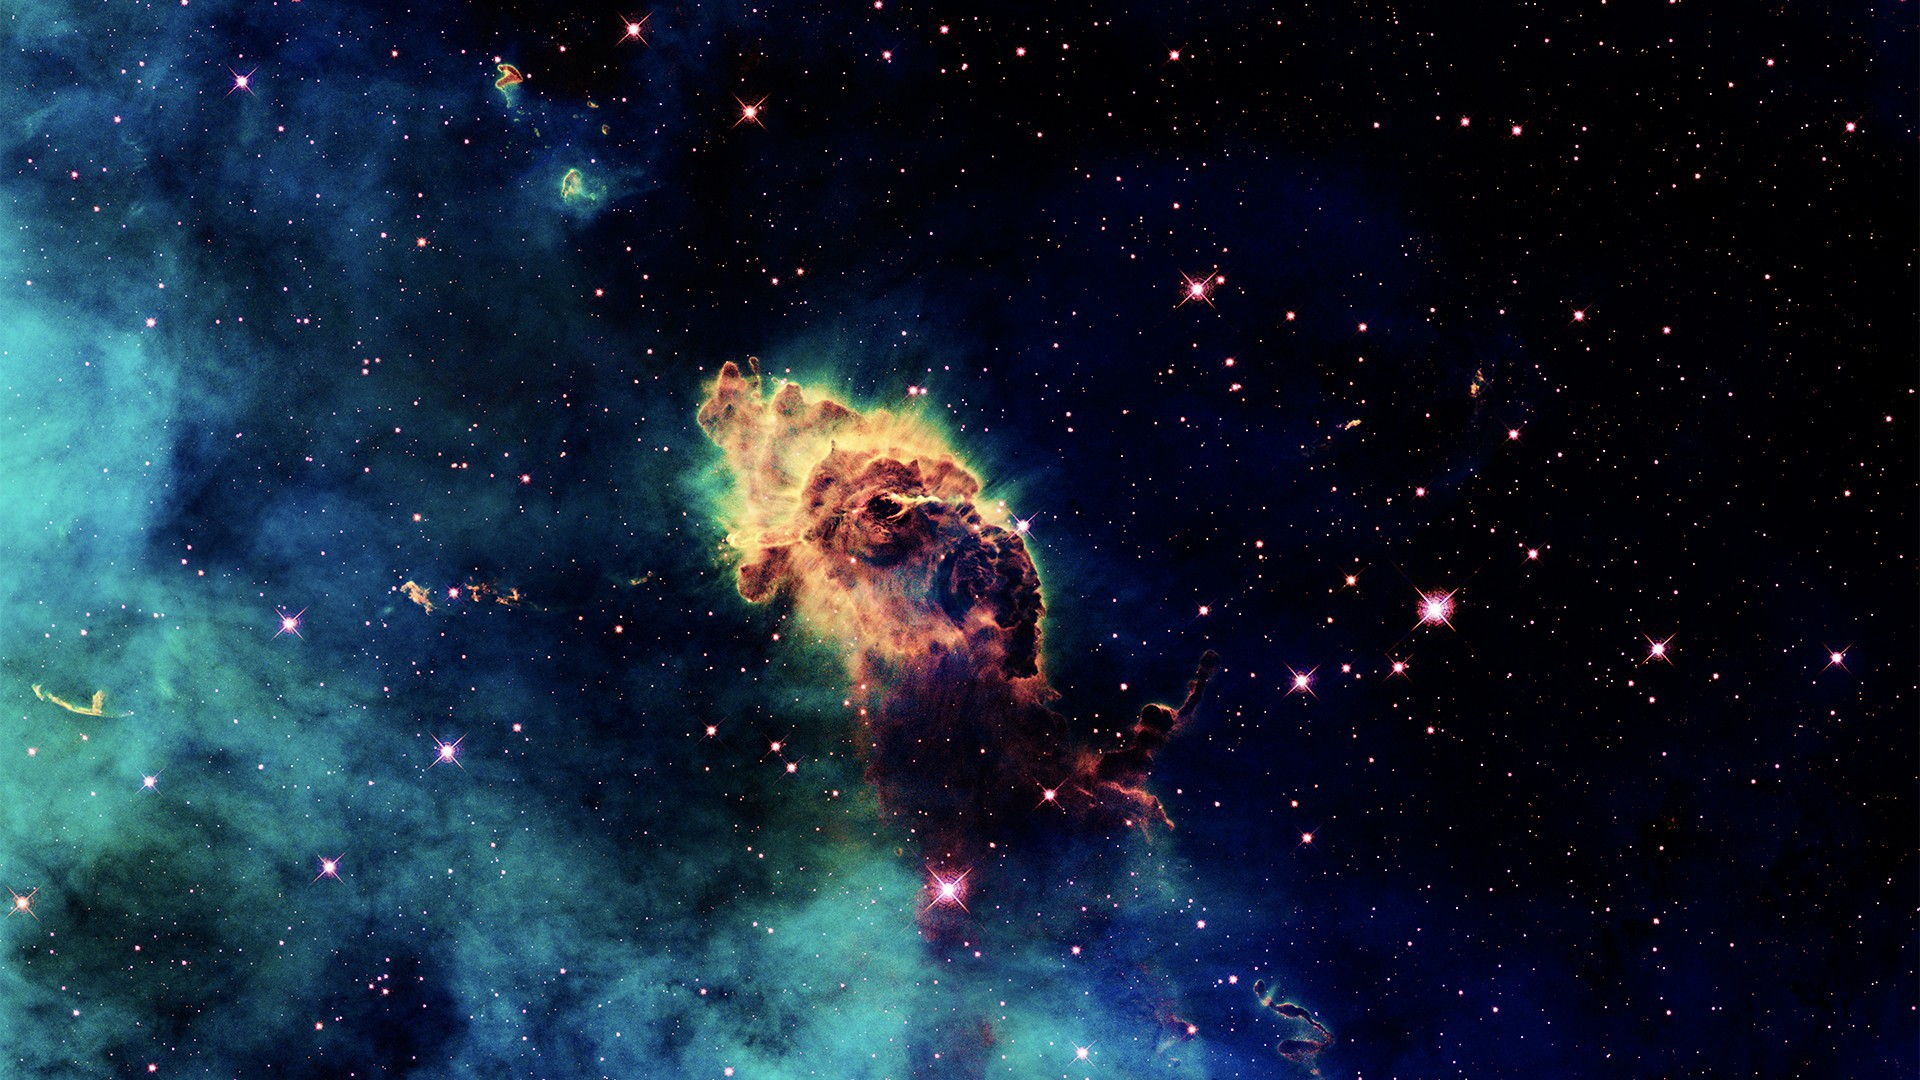 Философия в картинках - Страница 4 Space_Asteroid_flying_in_space_041406_